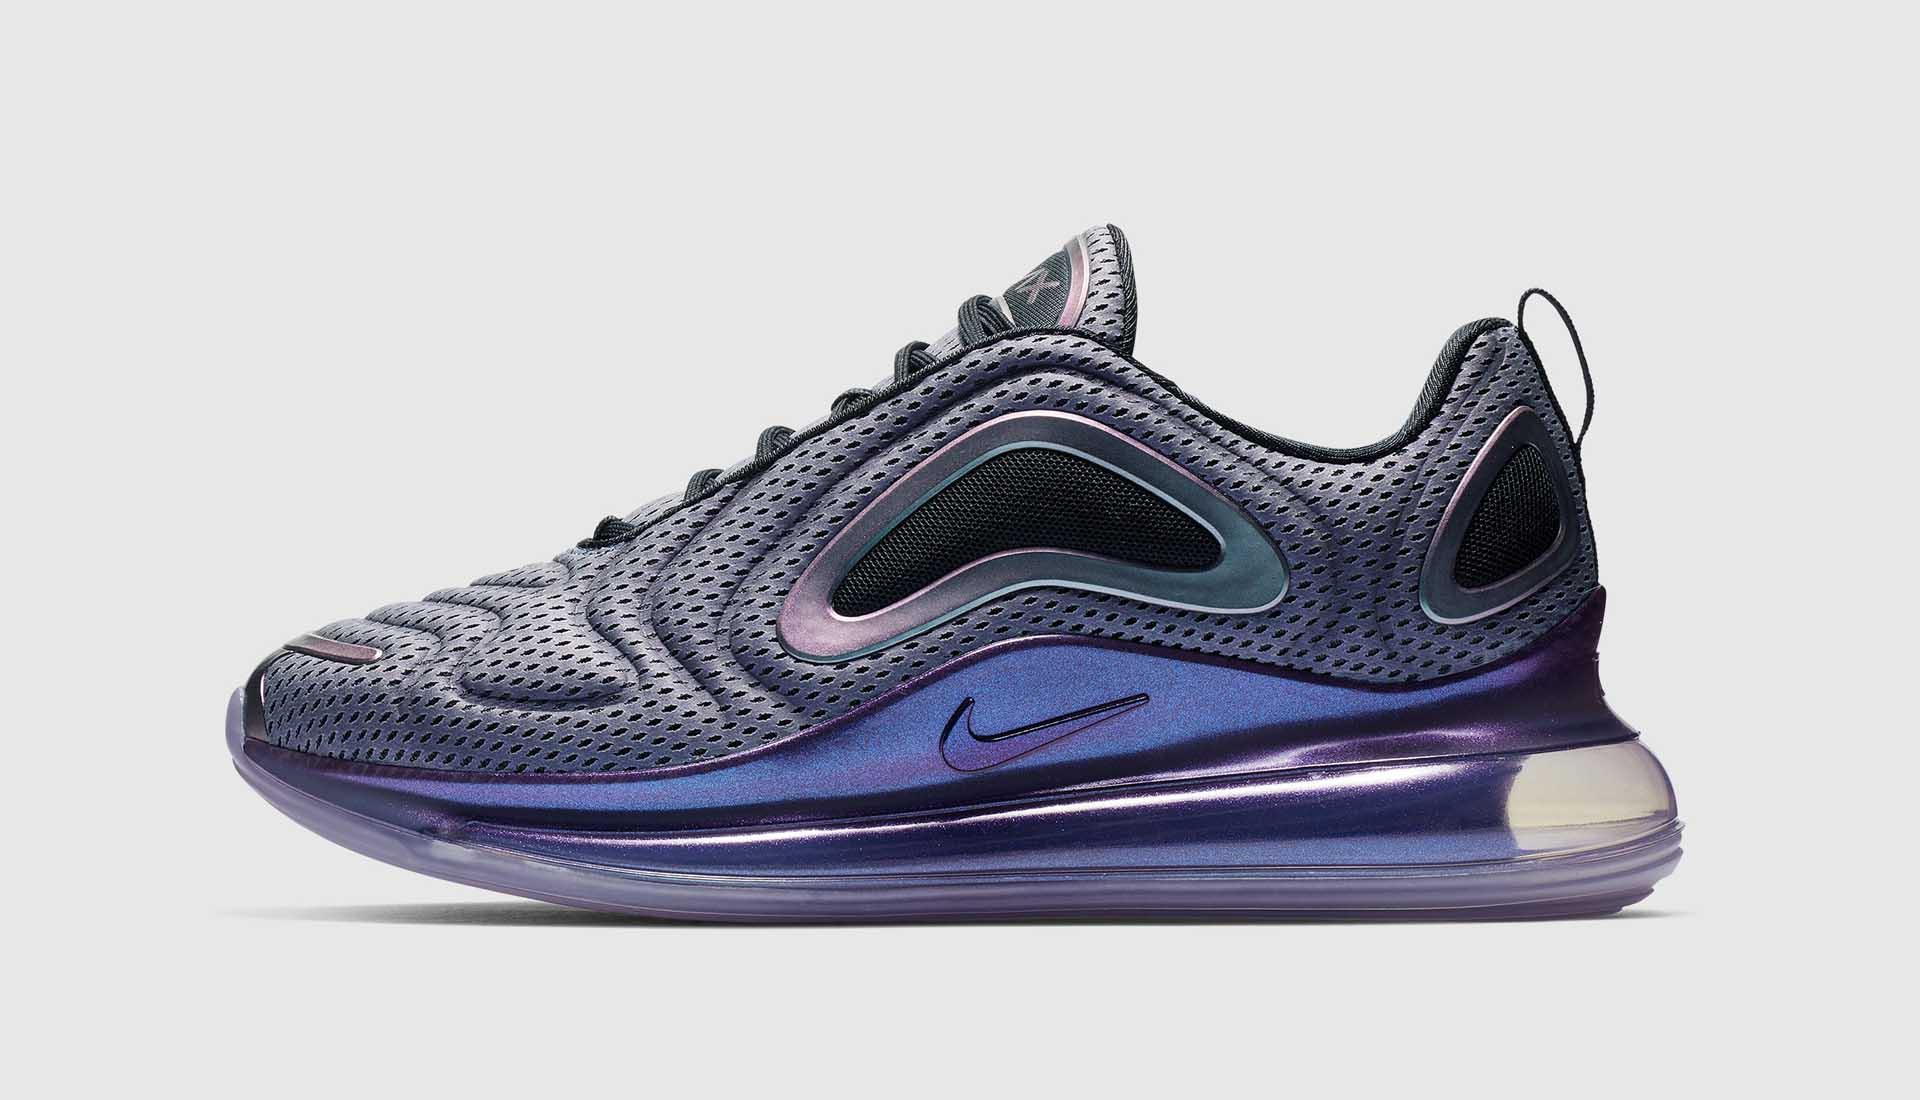 Nike Air Max 720 Nears Drop Date